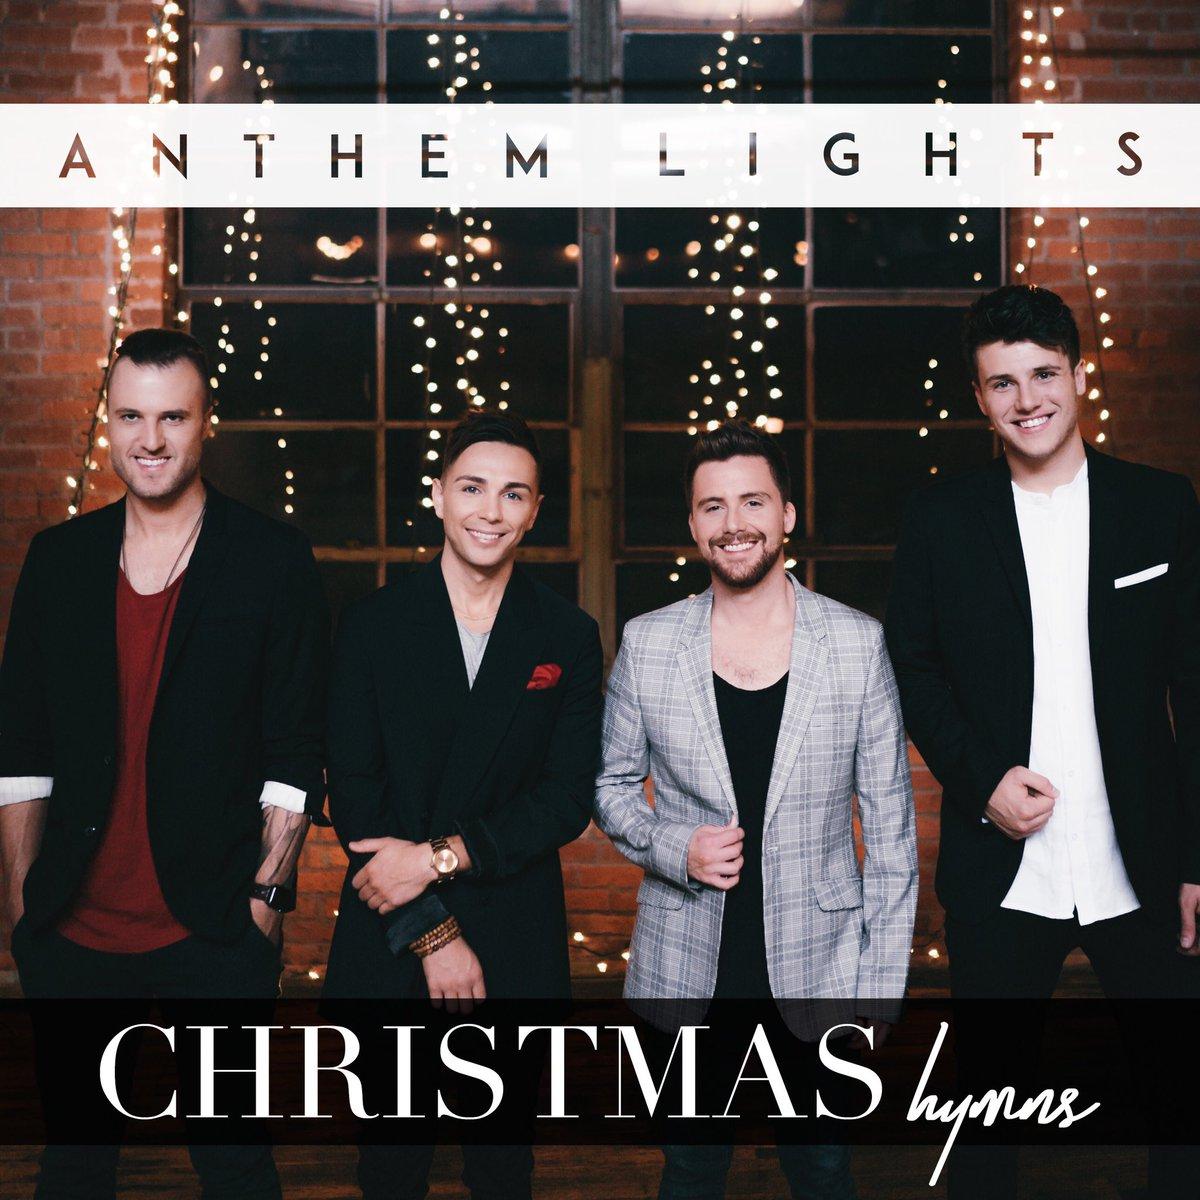 Anthem Lights (@anthemlights) | Twitter